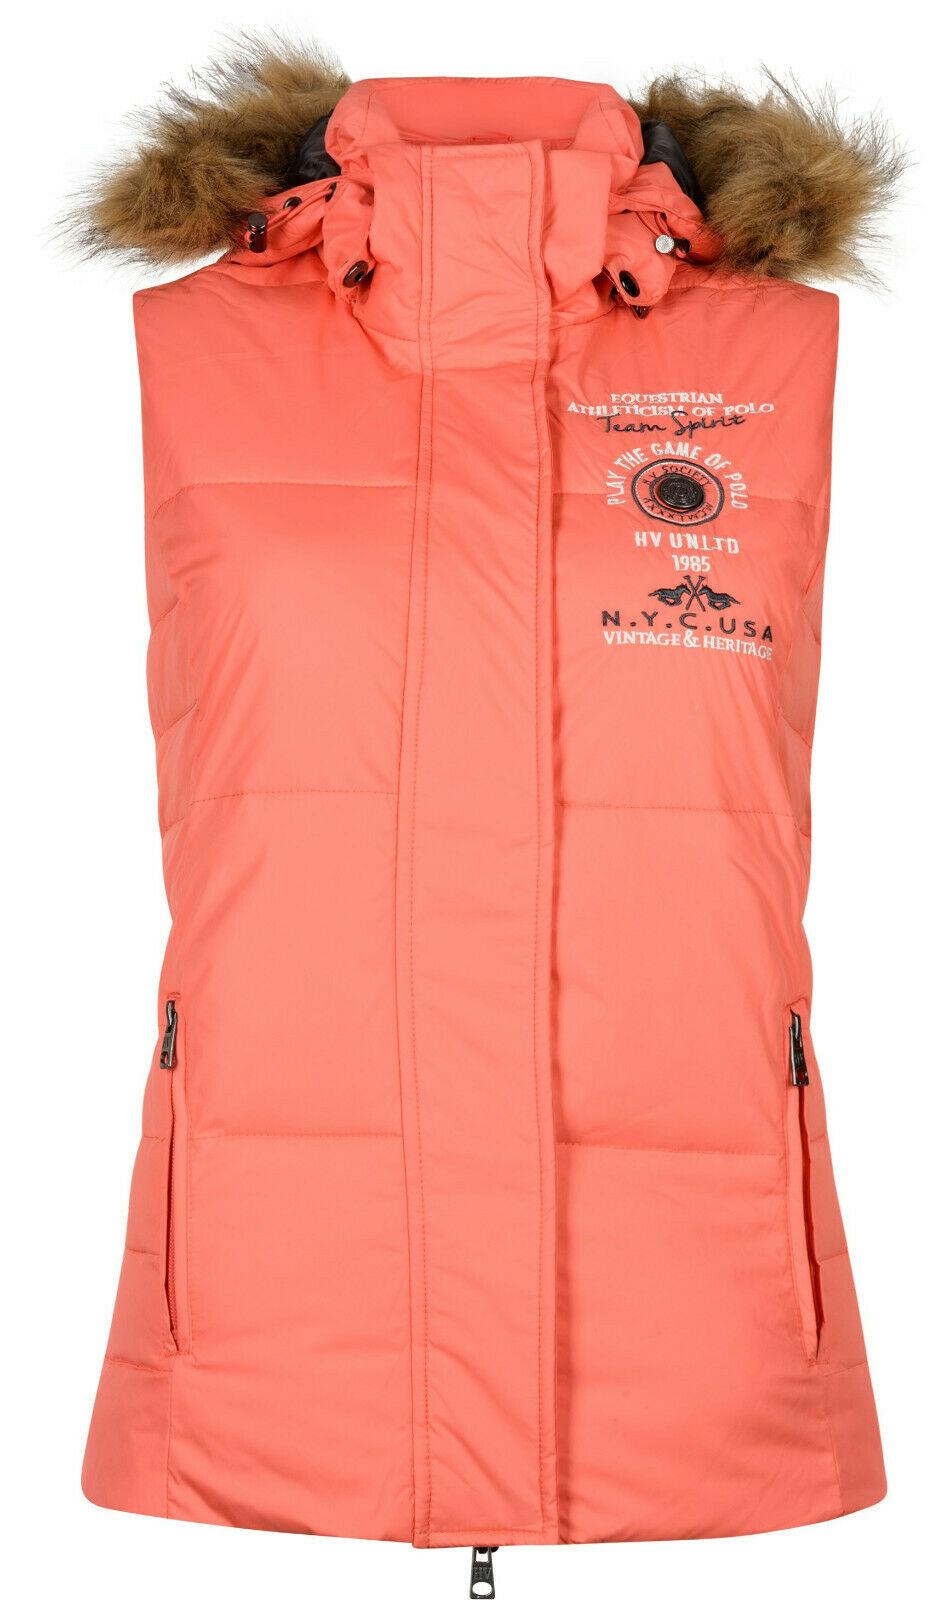 HV Polo Damen Bodywarmer Reitweste Malo abnehmbare Kapuze mit Kunstpelz